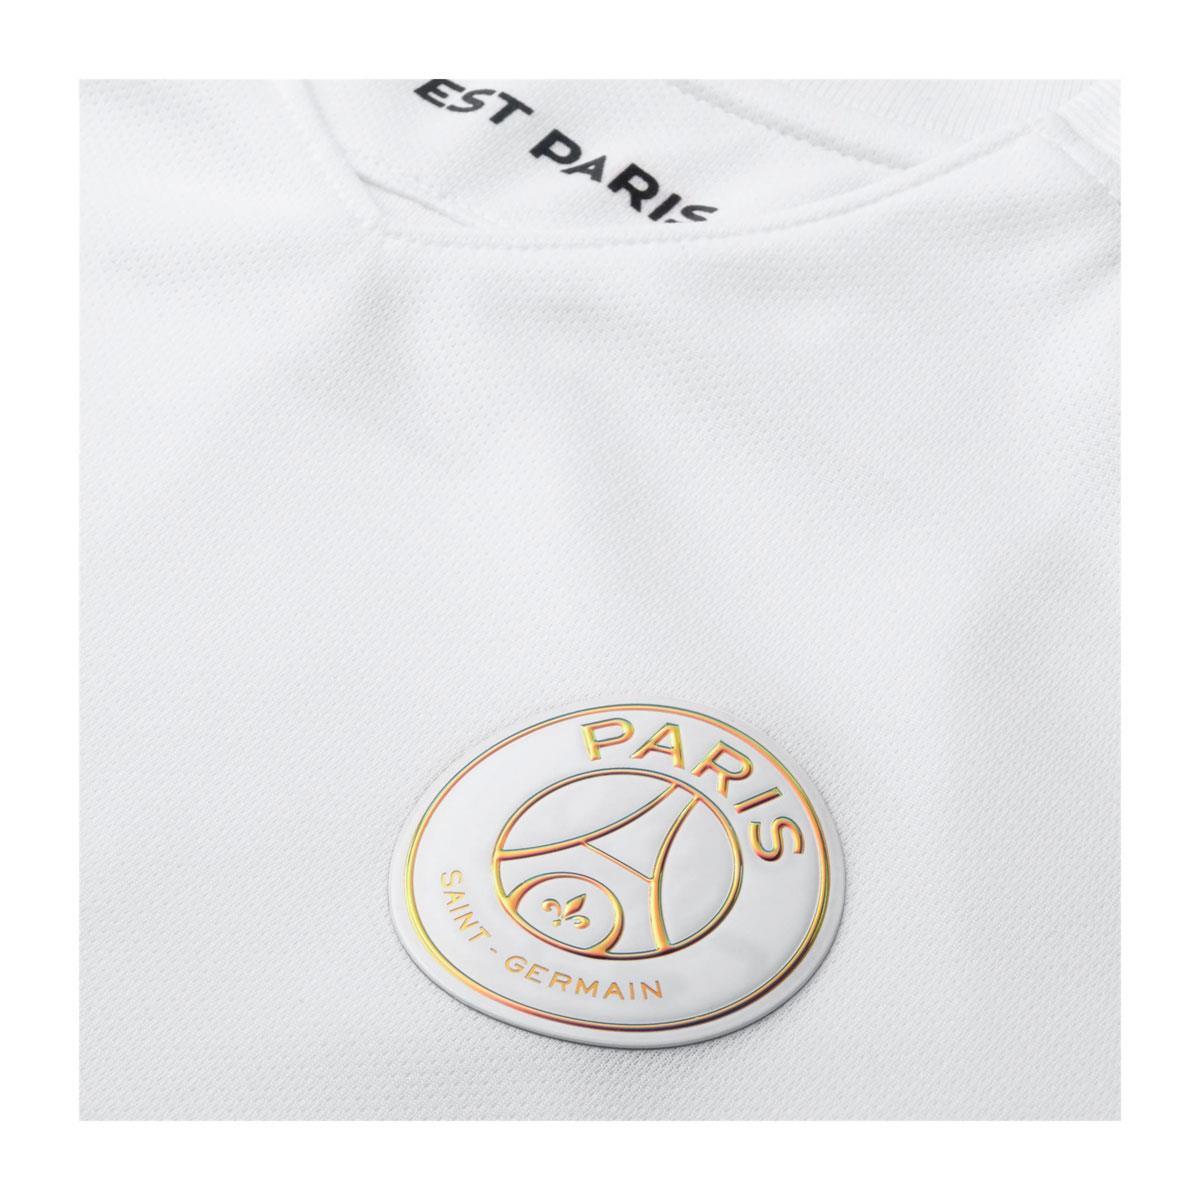 Camisa NiKe PSG III Torcedor 2016 2017 Branca 65b2cfd95ad78